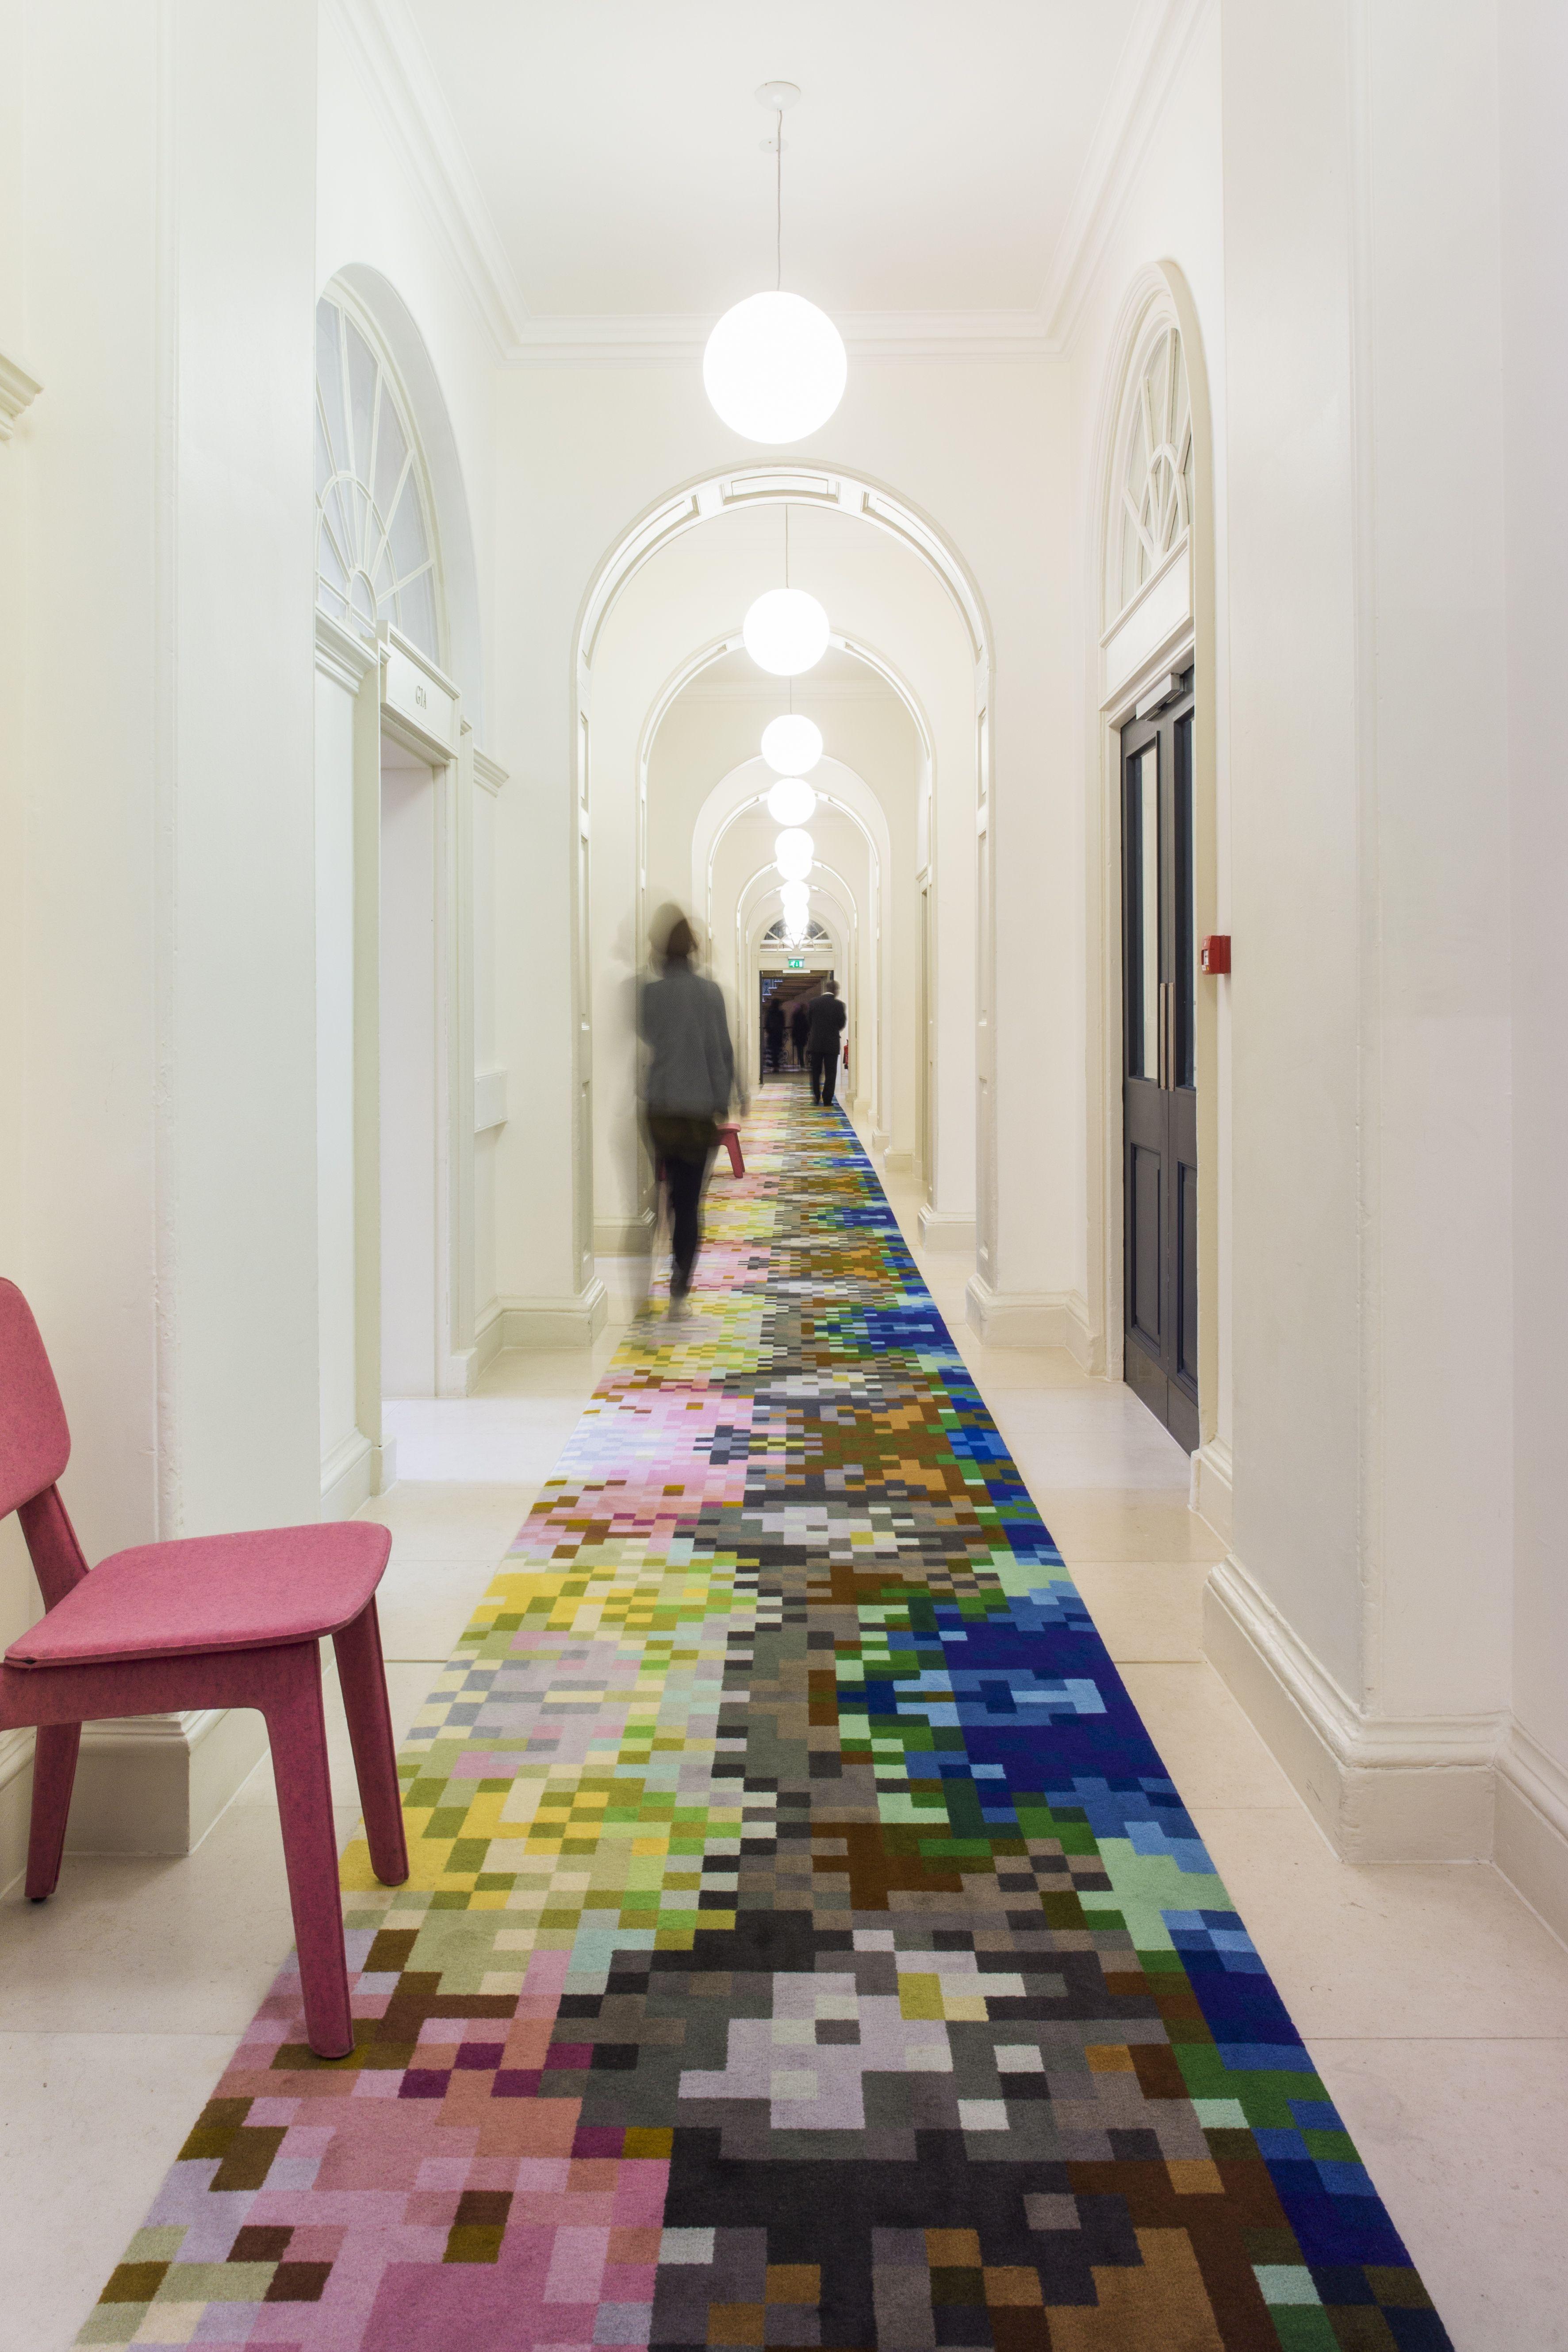 Somerset House In London England Government Commercialspaces Commercialinteriors Design Flooring Hallway Designs Corridor Design Design